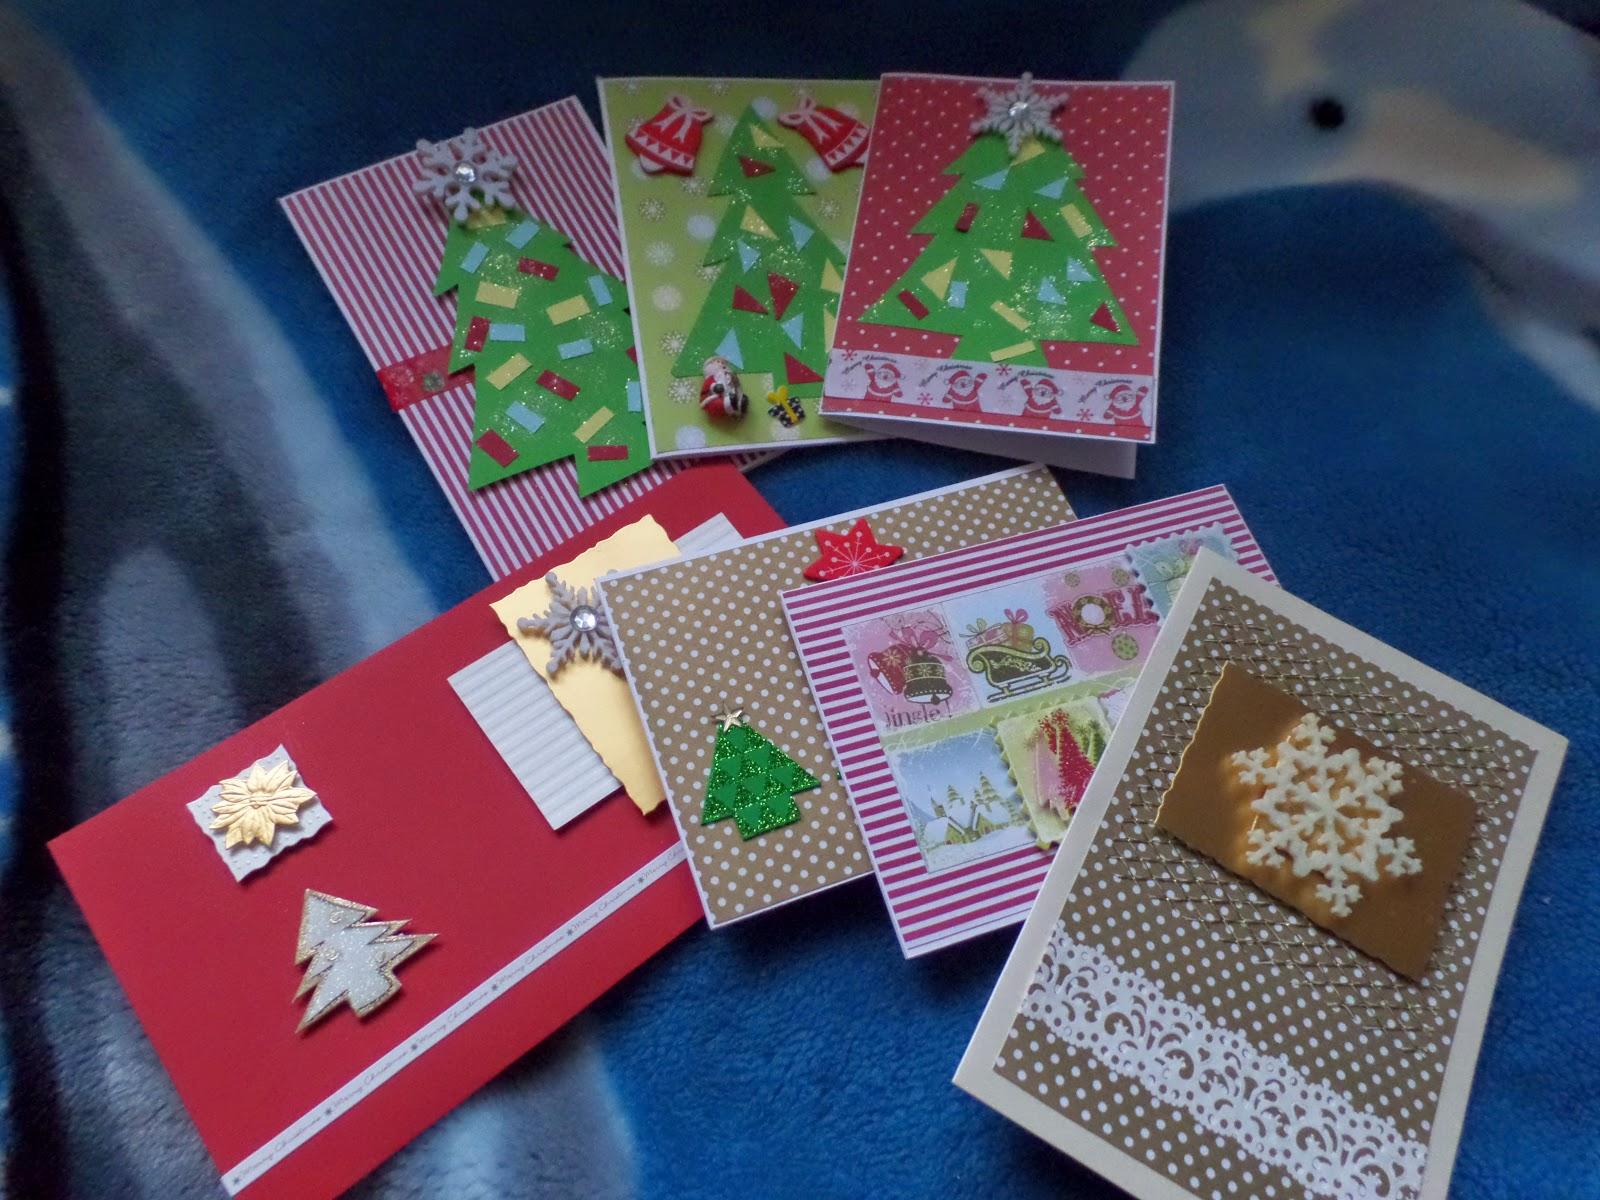 20. Kartki świąteczne - handmade ;)